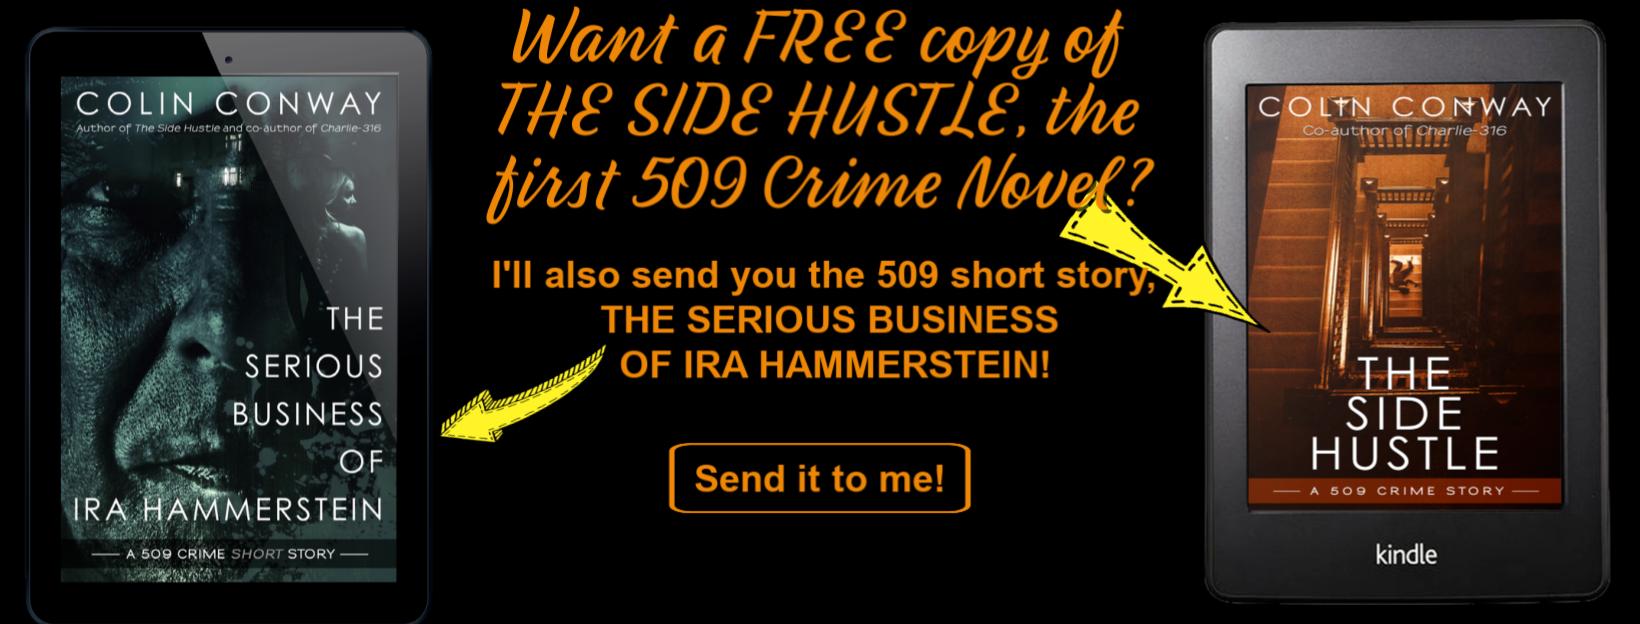 Newsletter Ad black background (1).png